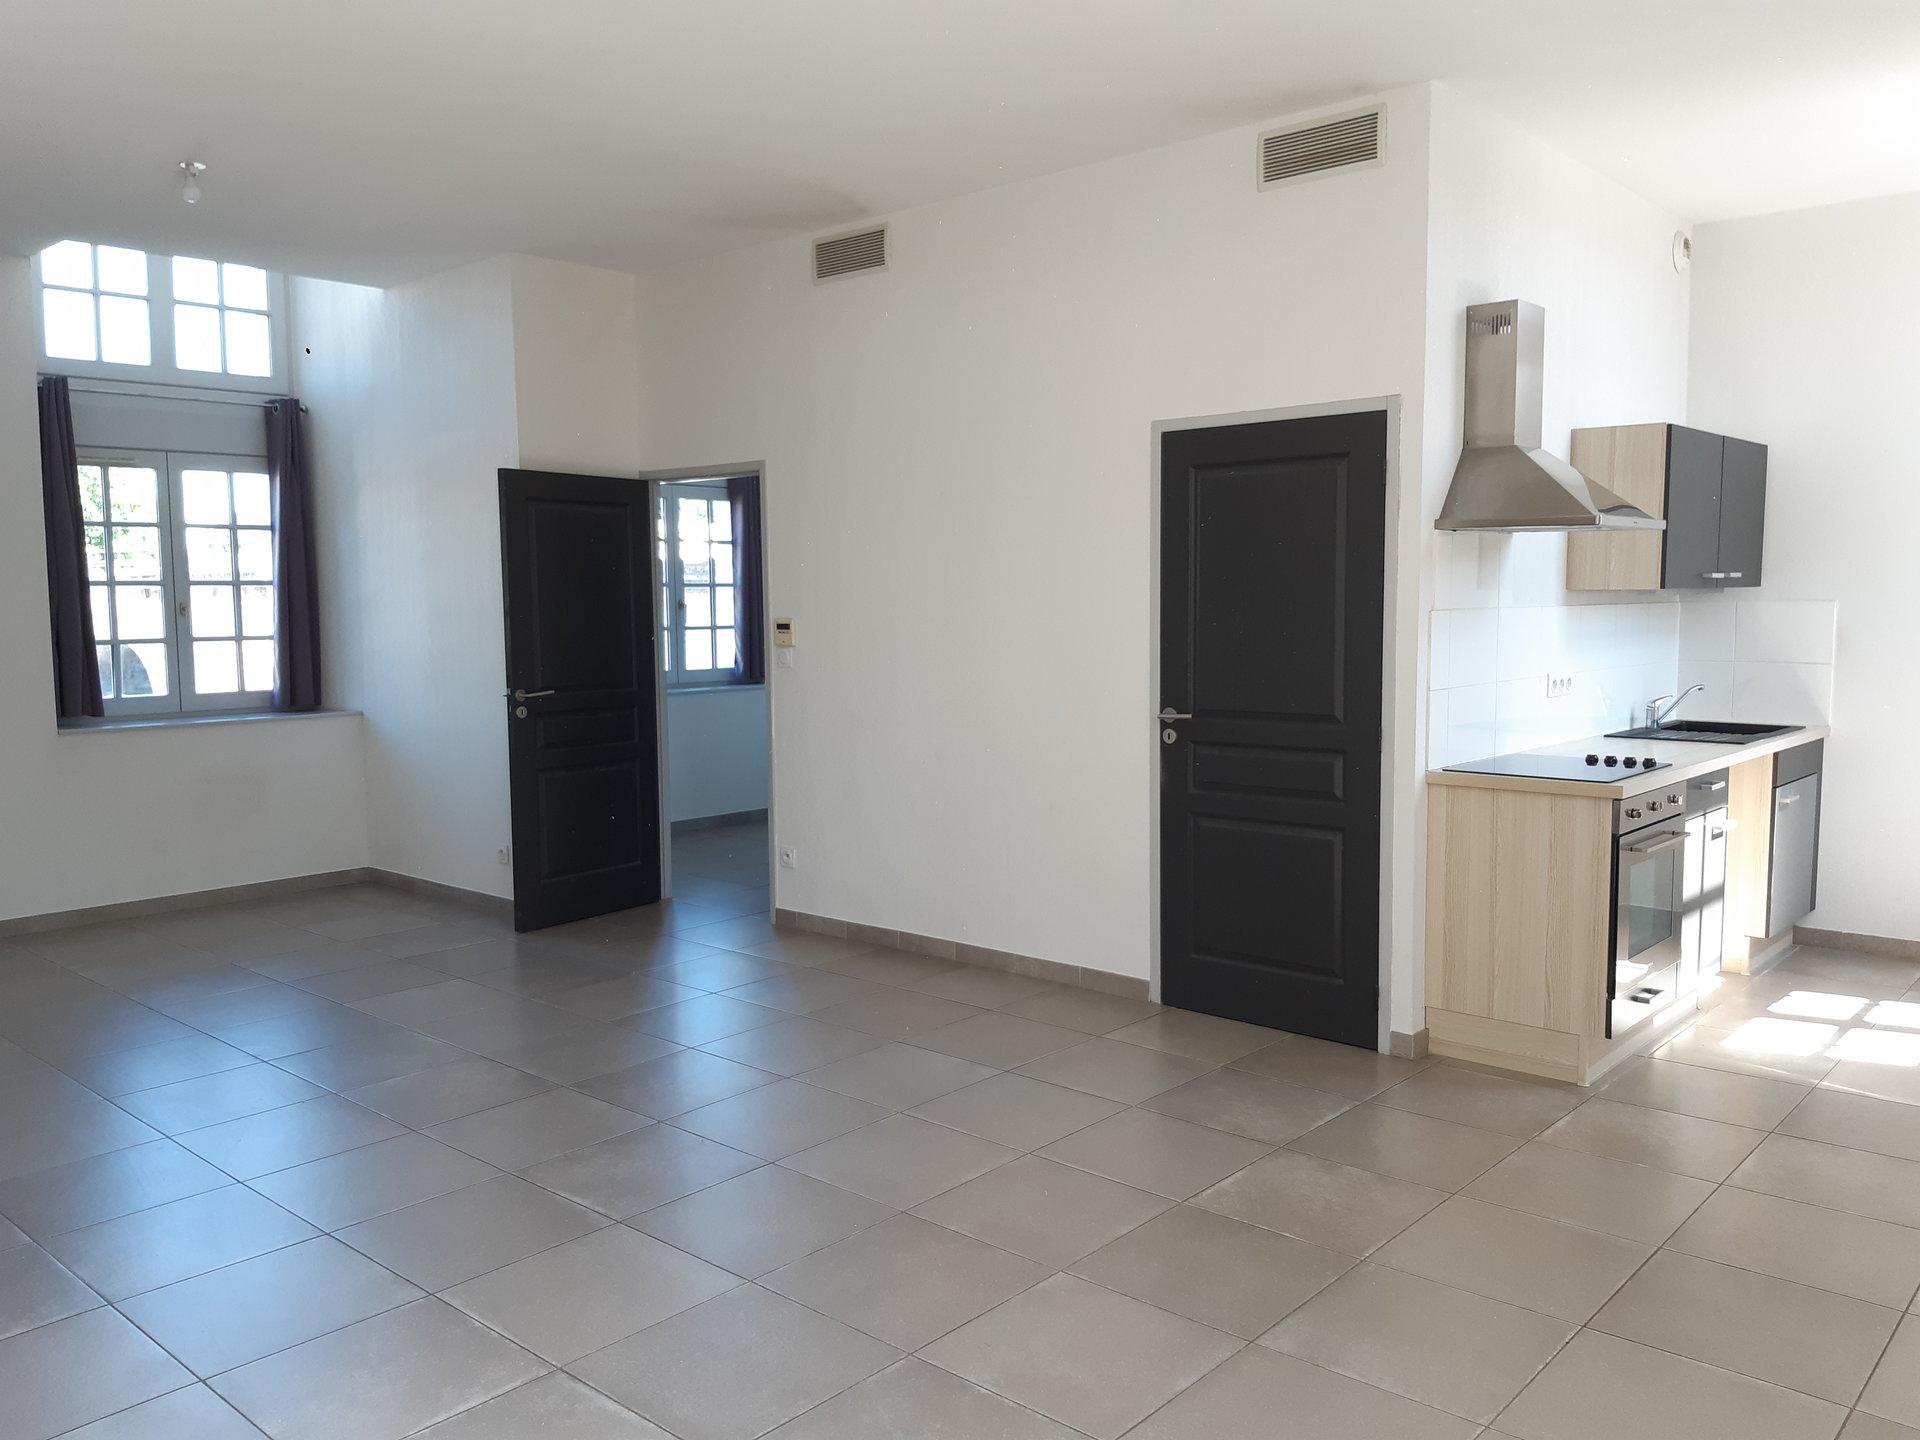 Location Appartement TARASCON Mandat : 0499